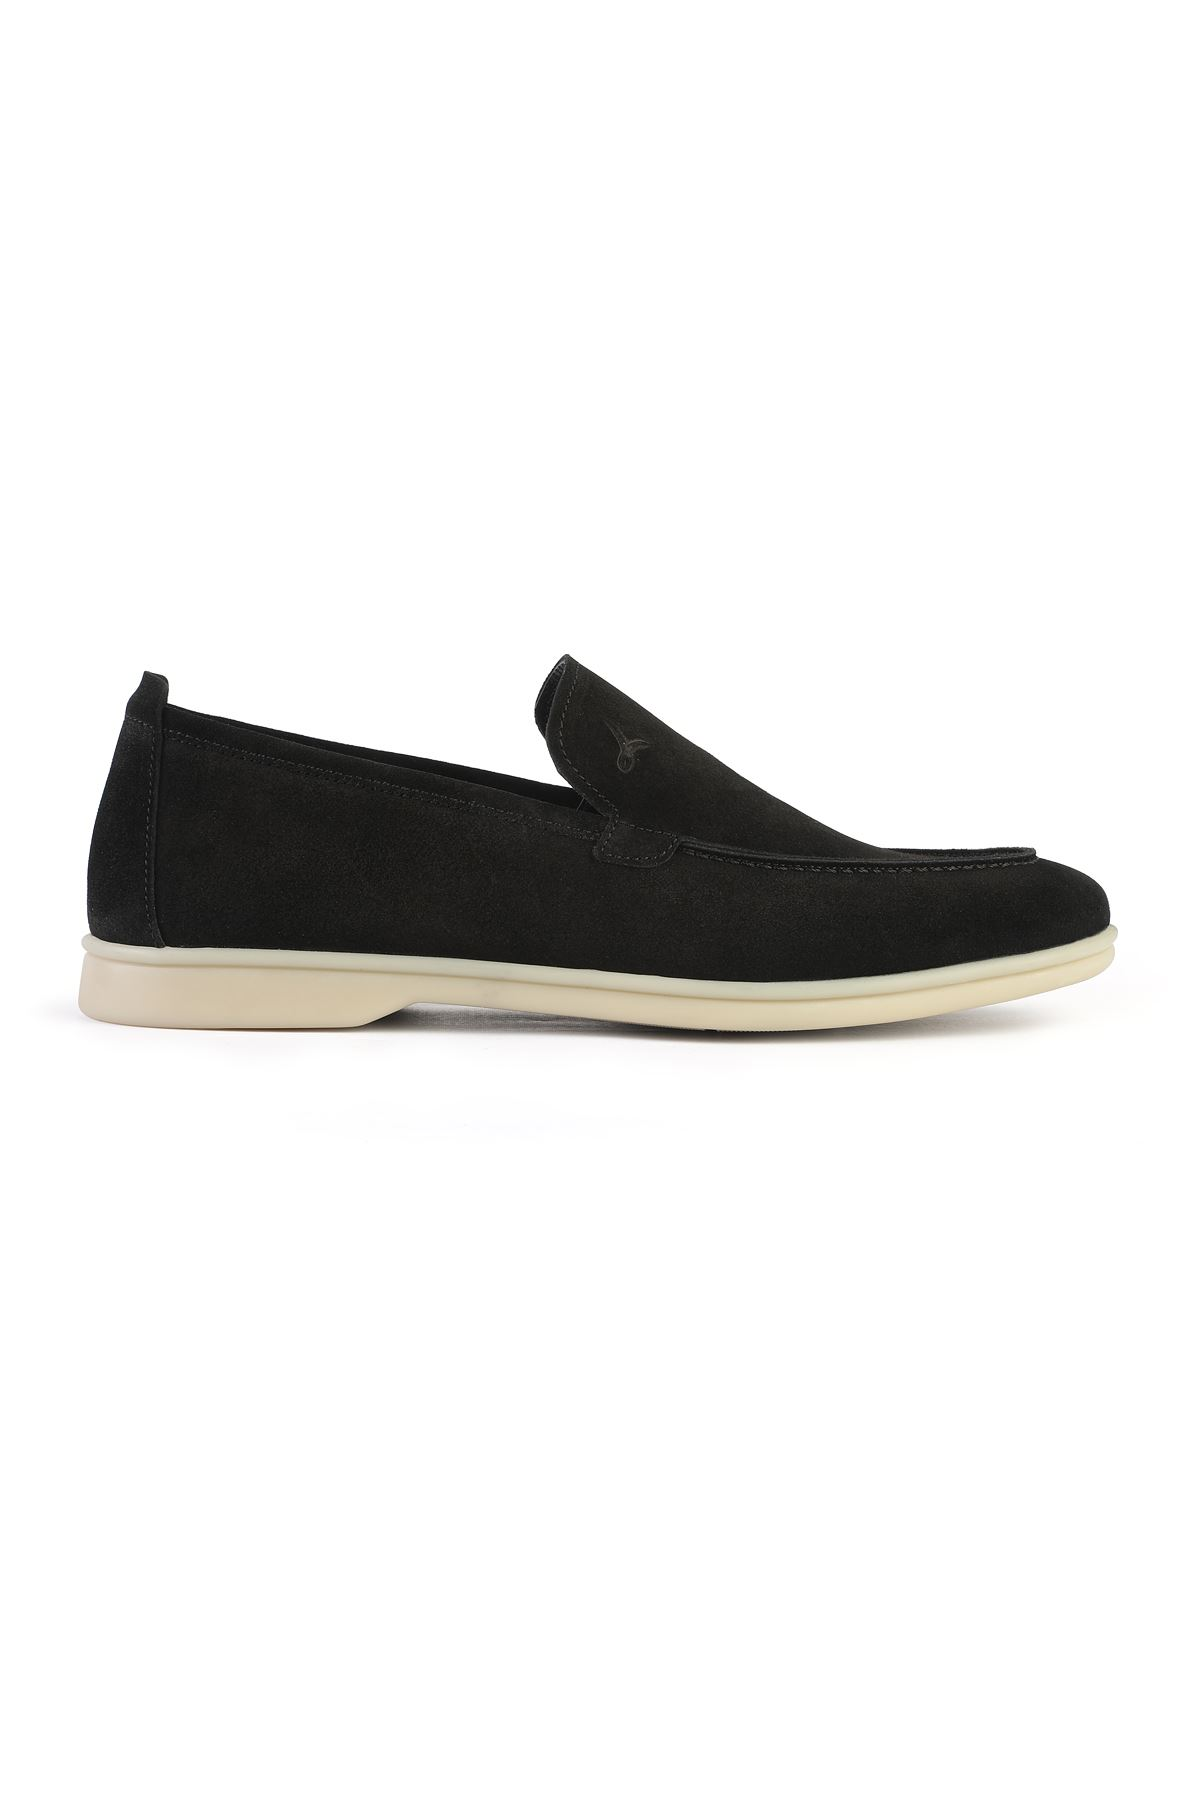 Libero 3004 Black Loafer Shoes